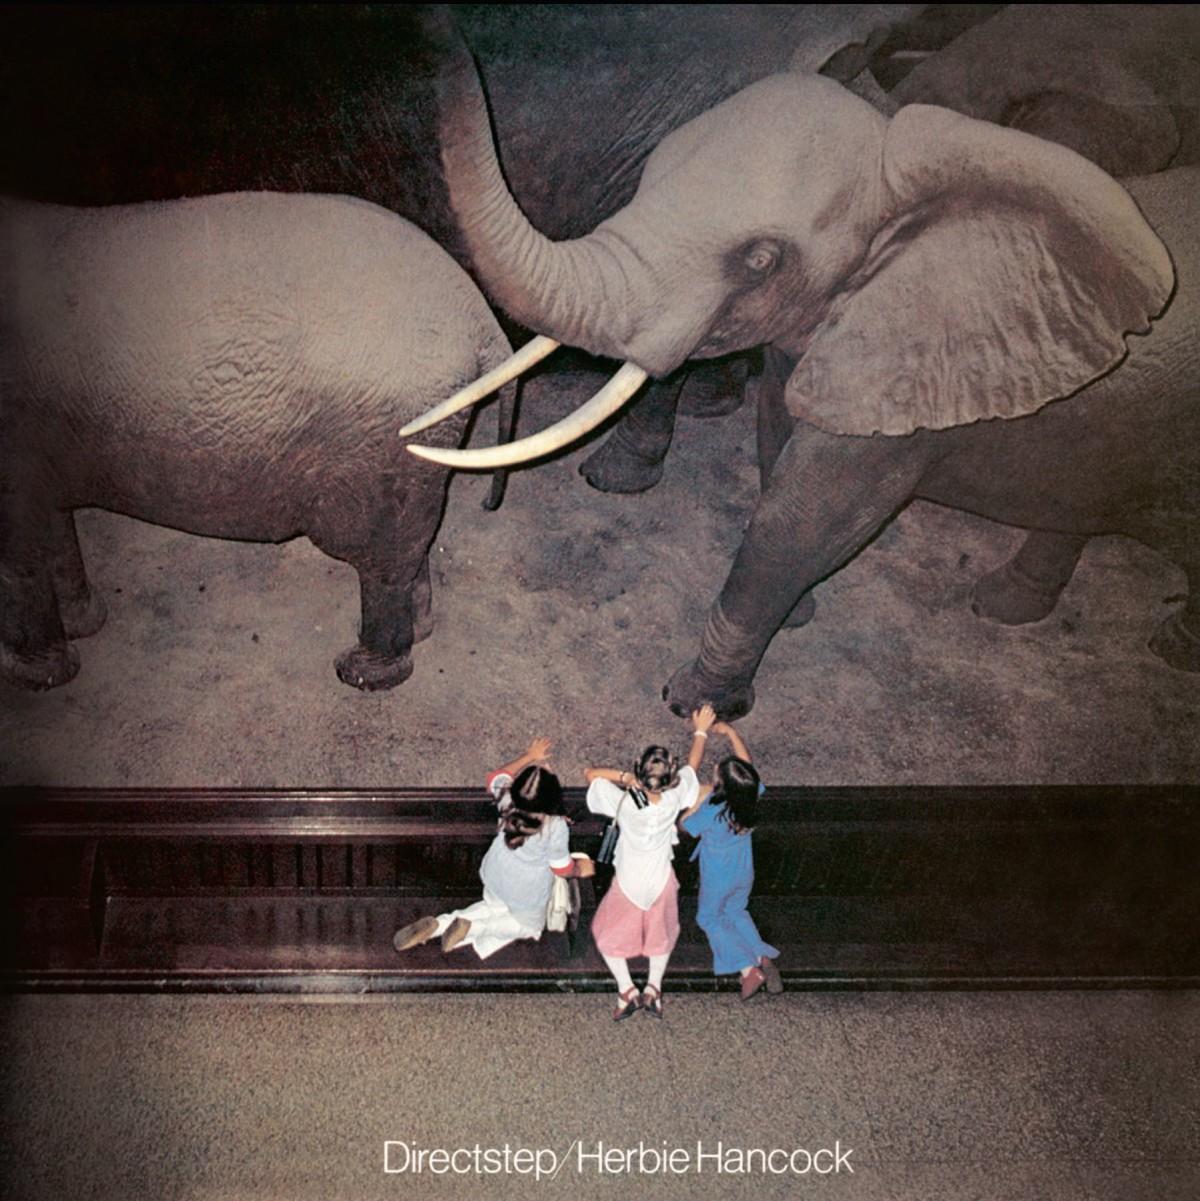 Herbie Hancock albums rated Directstep